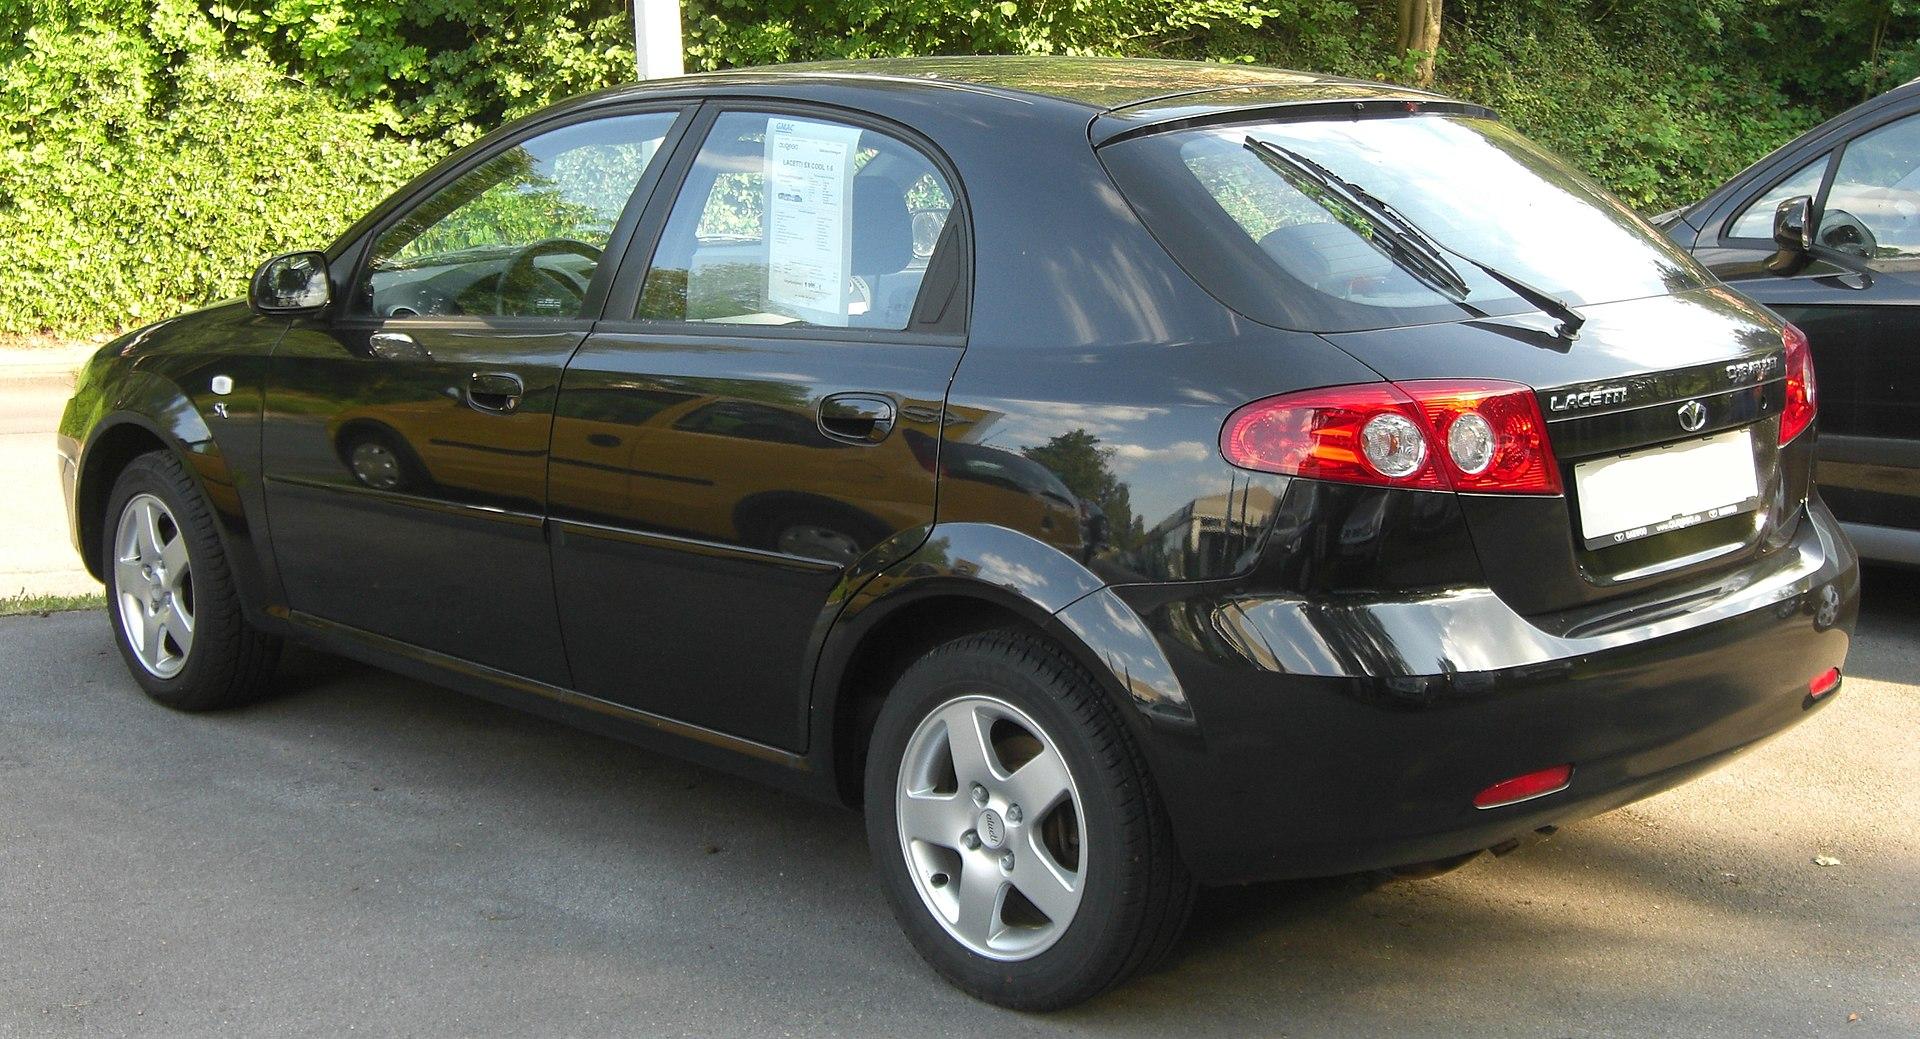 Chevrolet Lacetti - Wikipedija